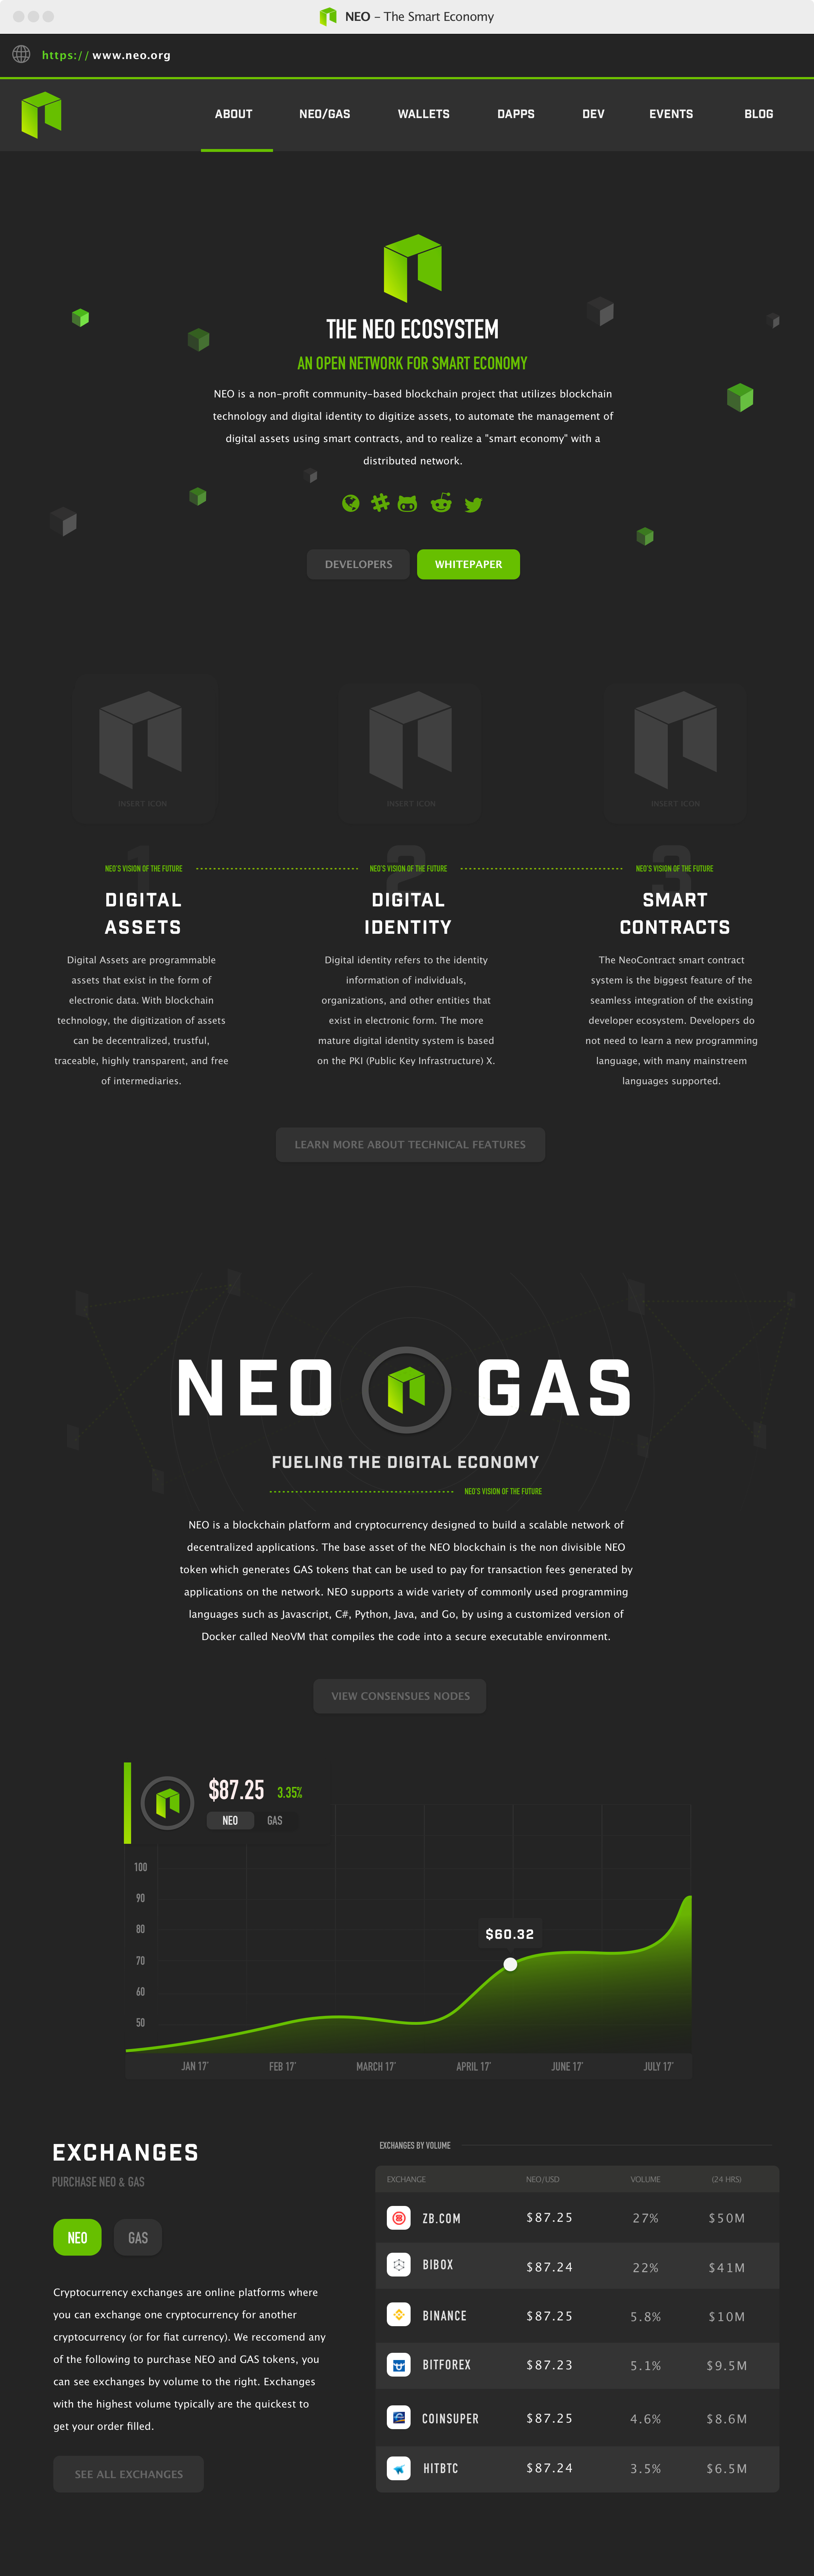 NEO Portfolio Image 1